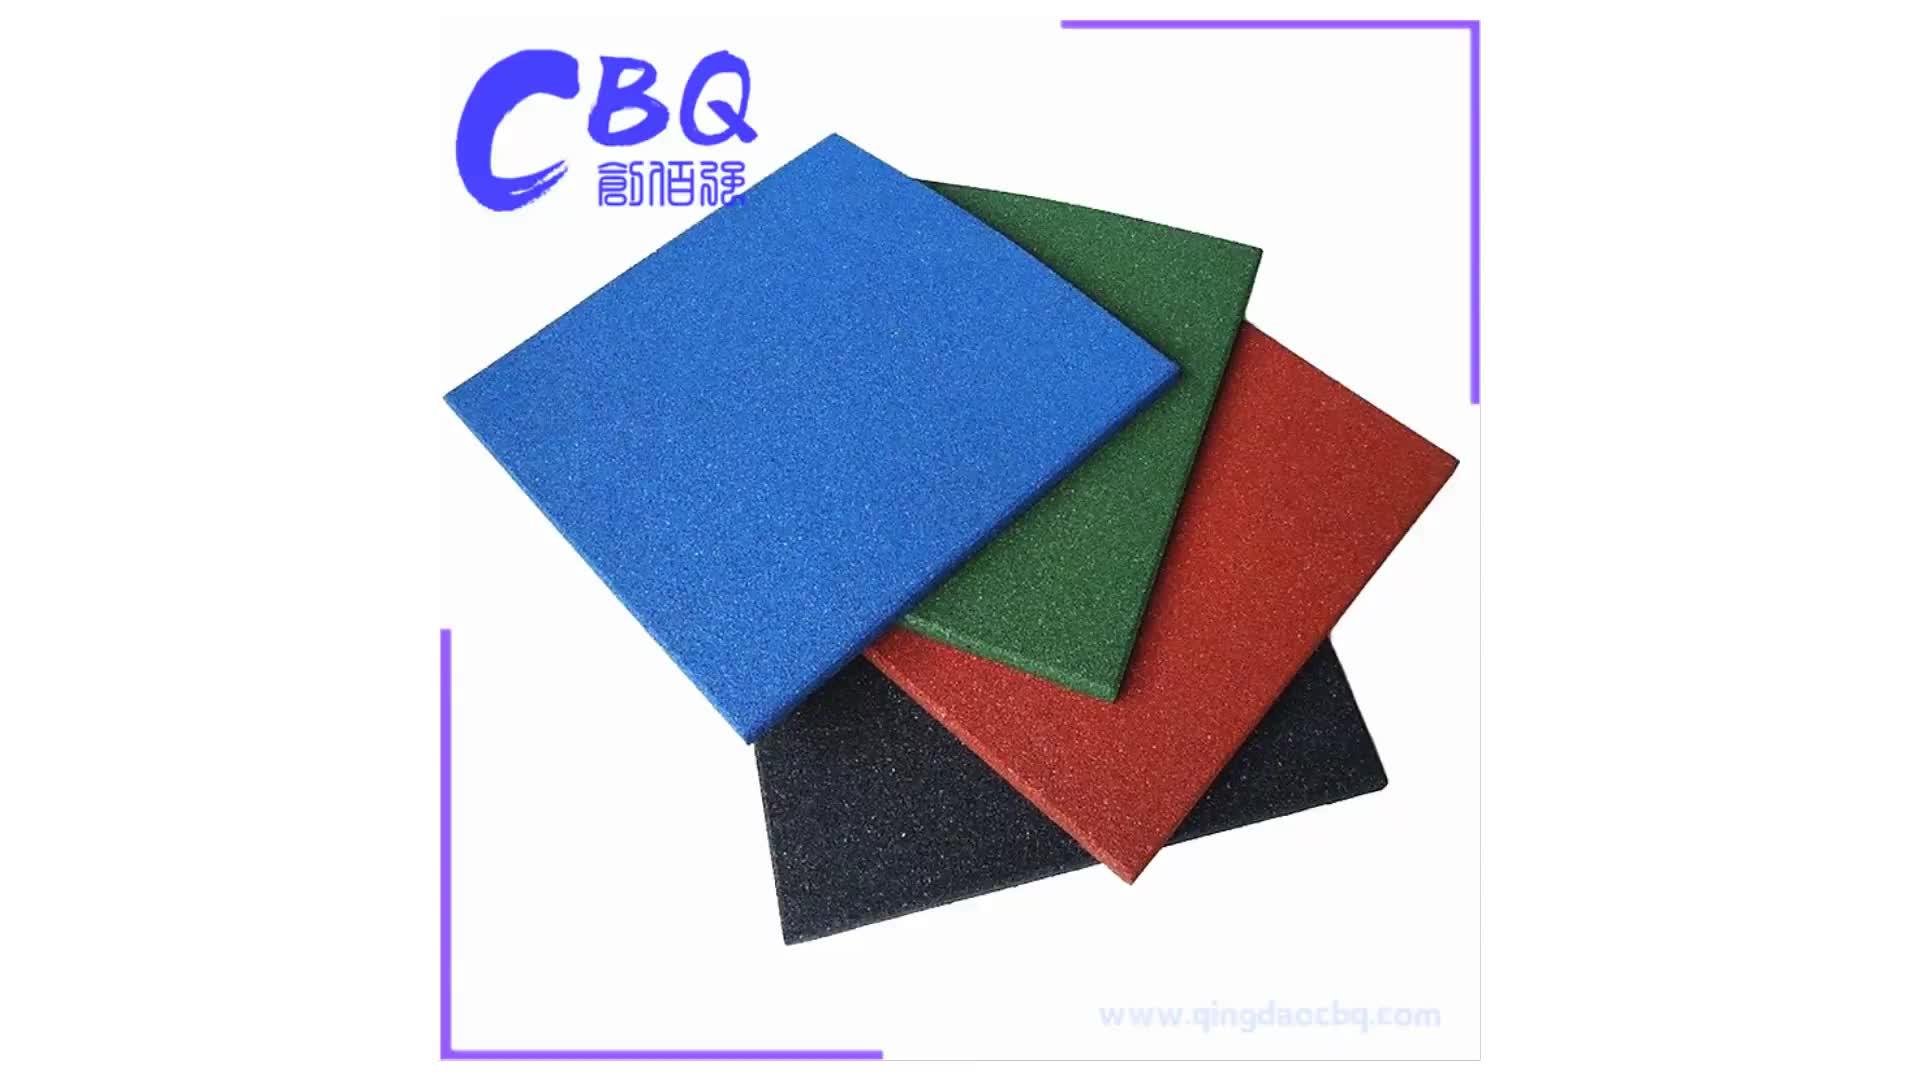 EN1177 fall height safety rubber mat, colorful EPDM rubber flooring tiles, durable anti-UV floor mats